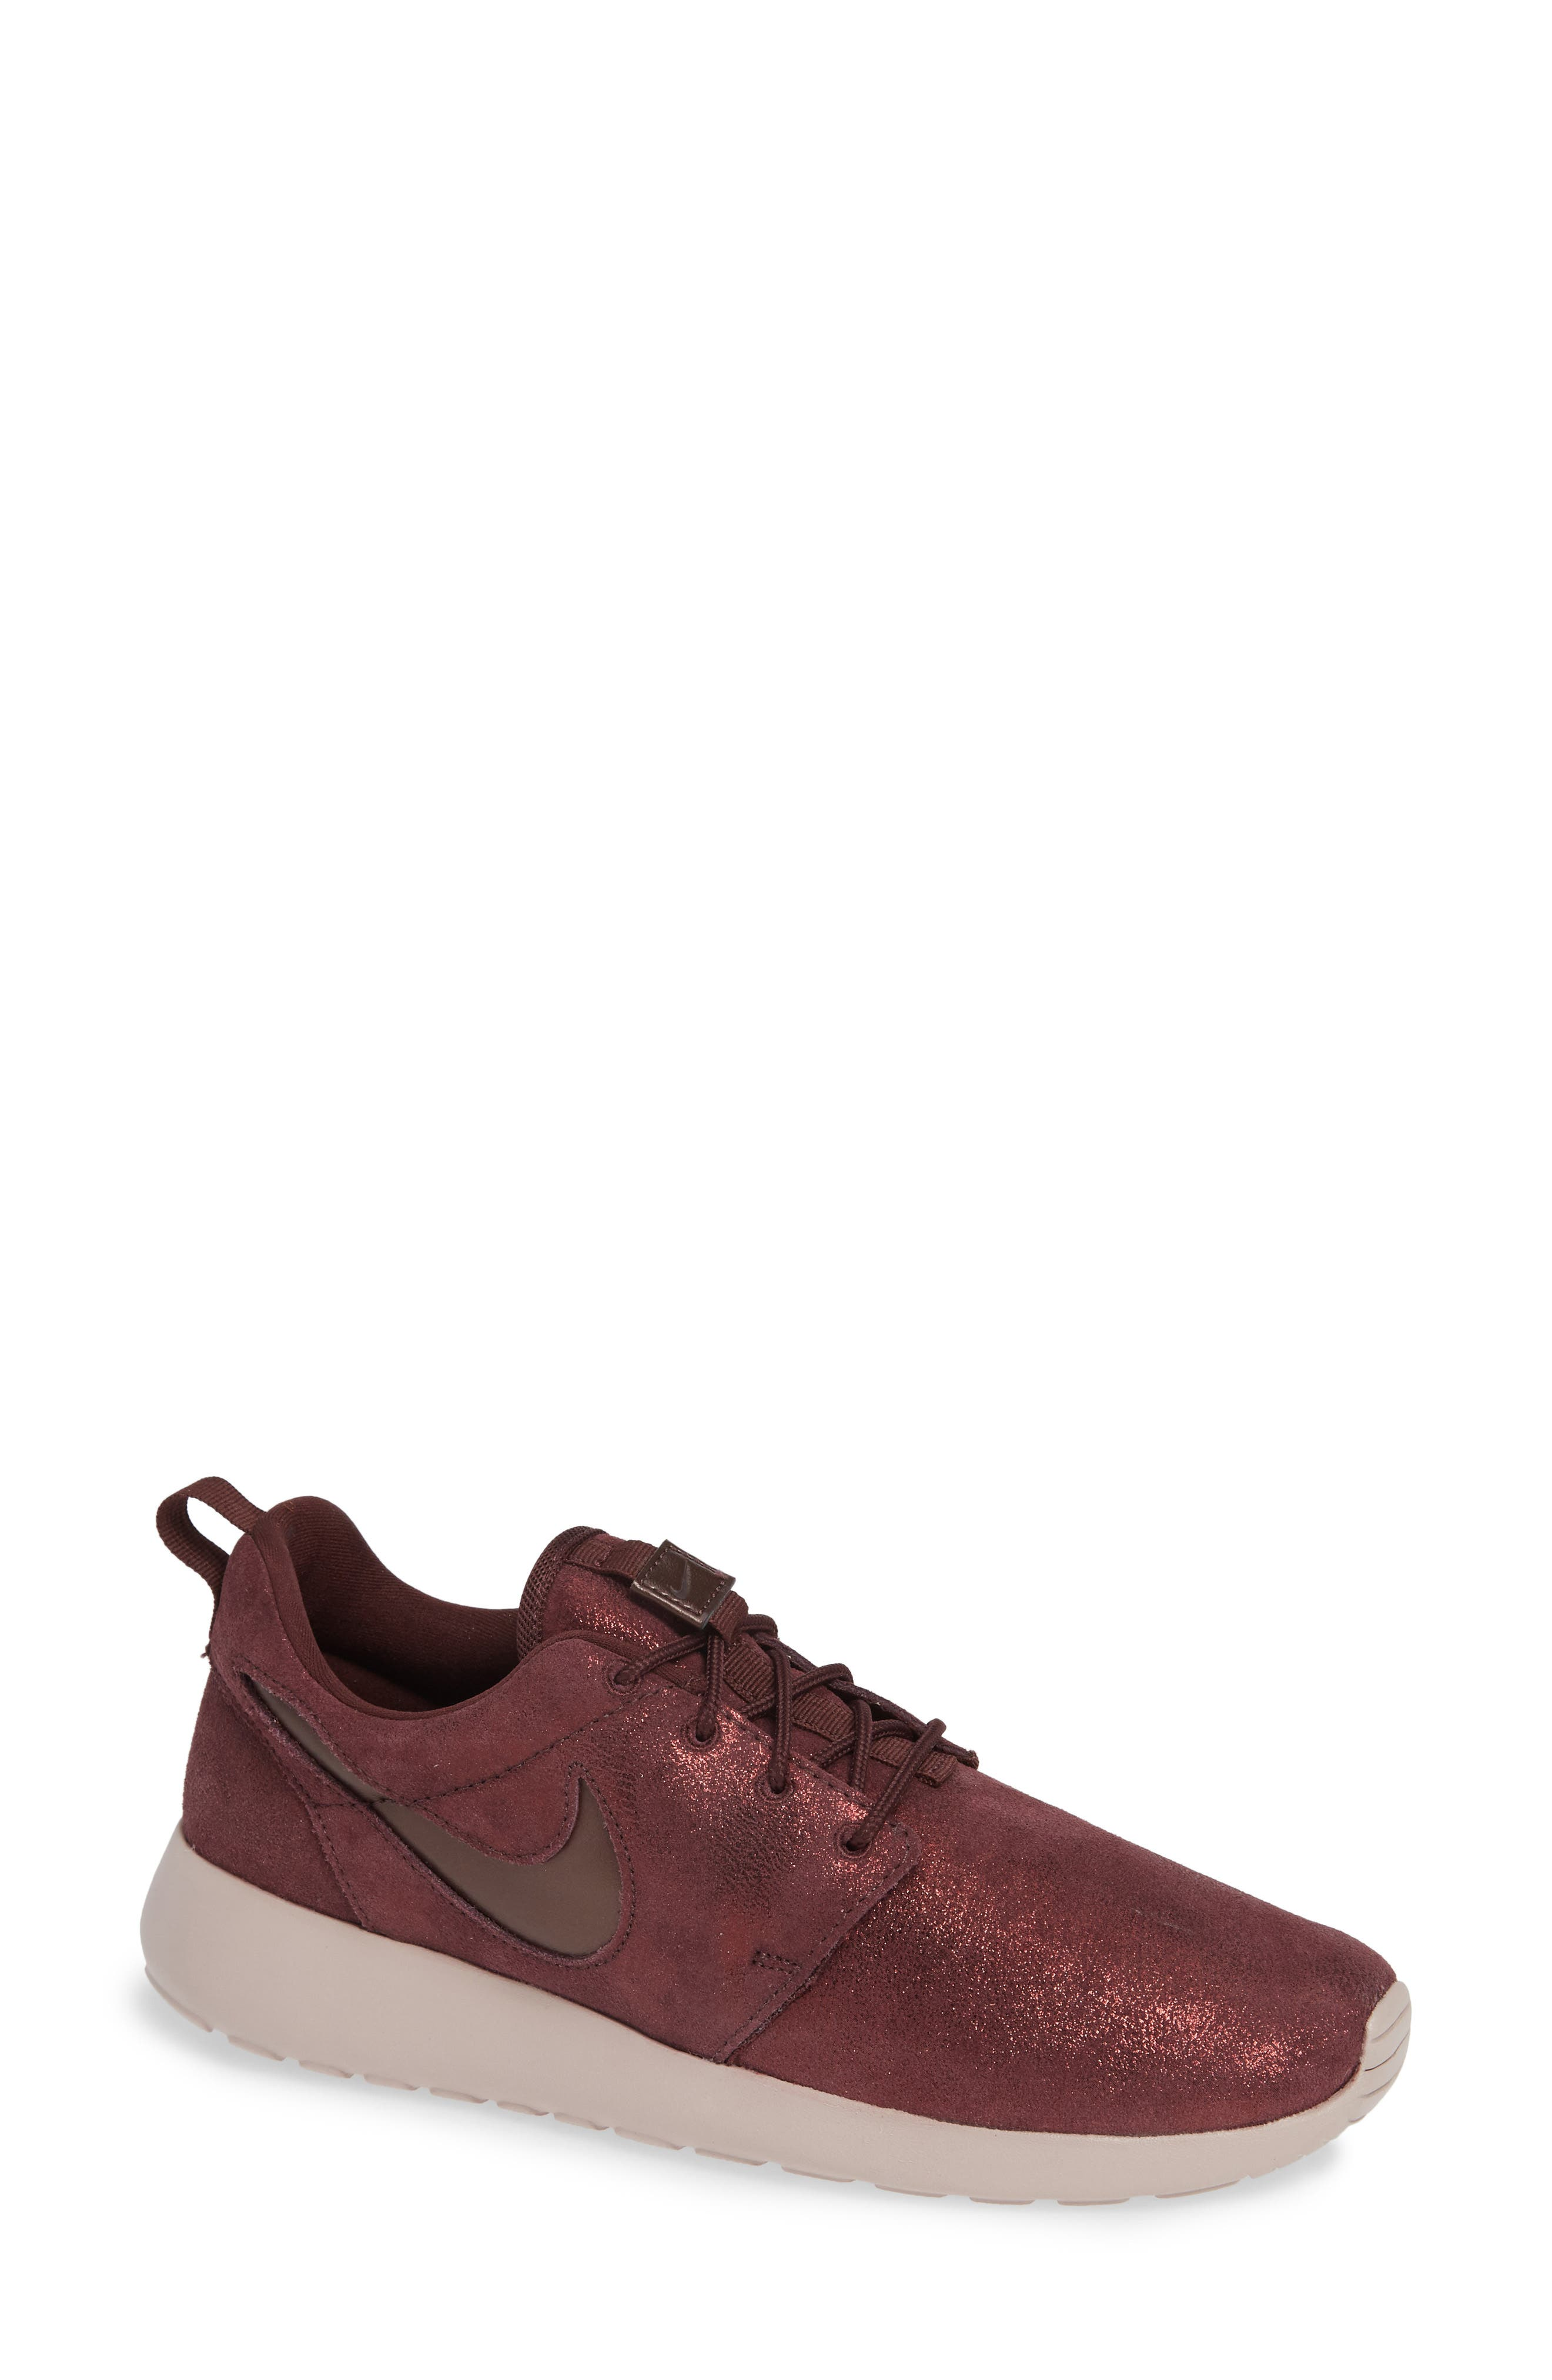 'Roshe Run' Print Sneaker,                         Main,                         color, METALLIC MAHOGANY/ MAHOGANY